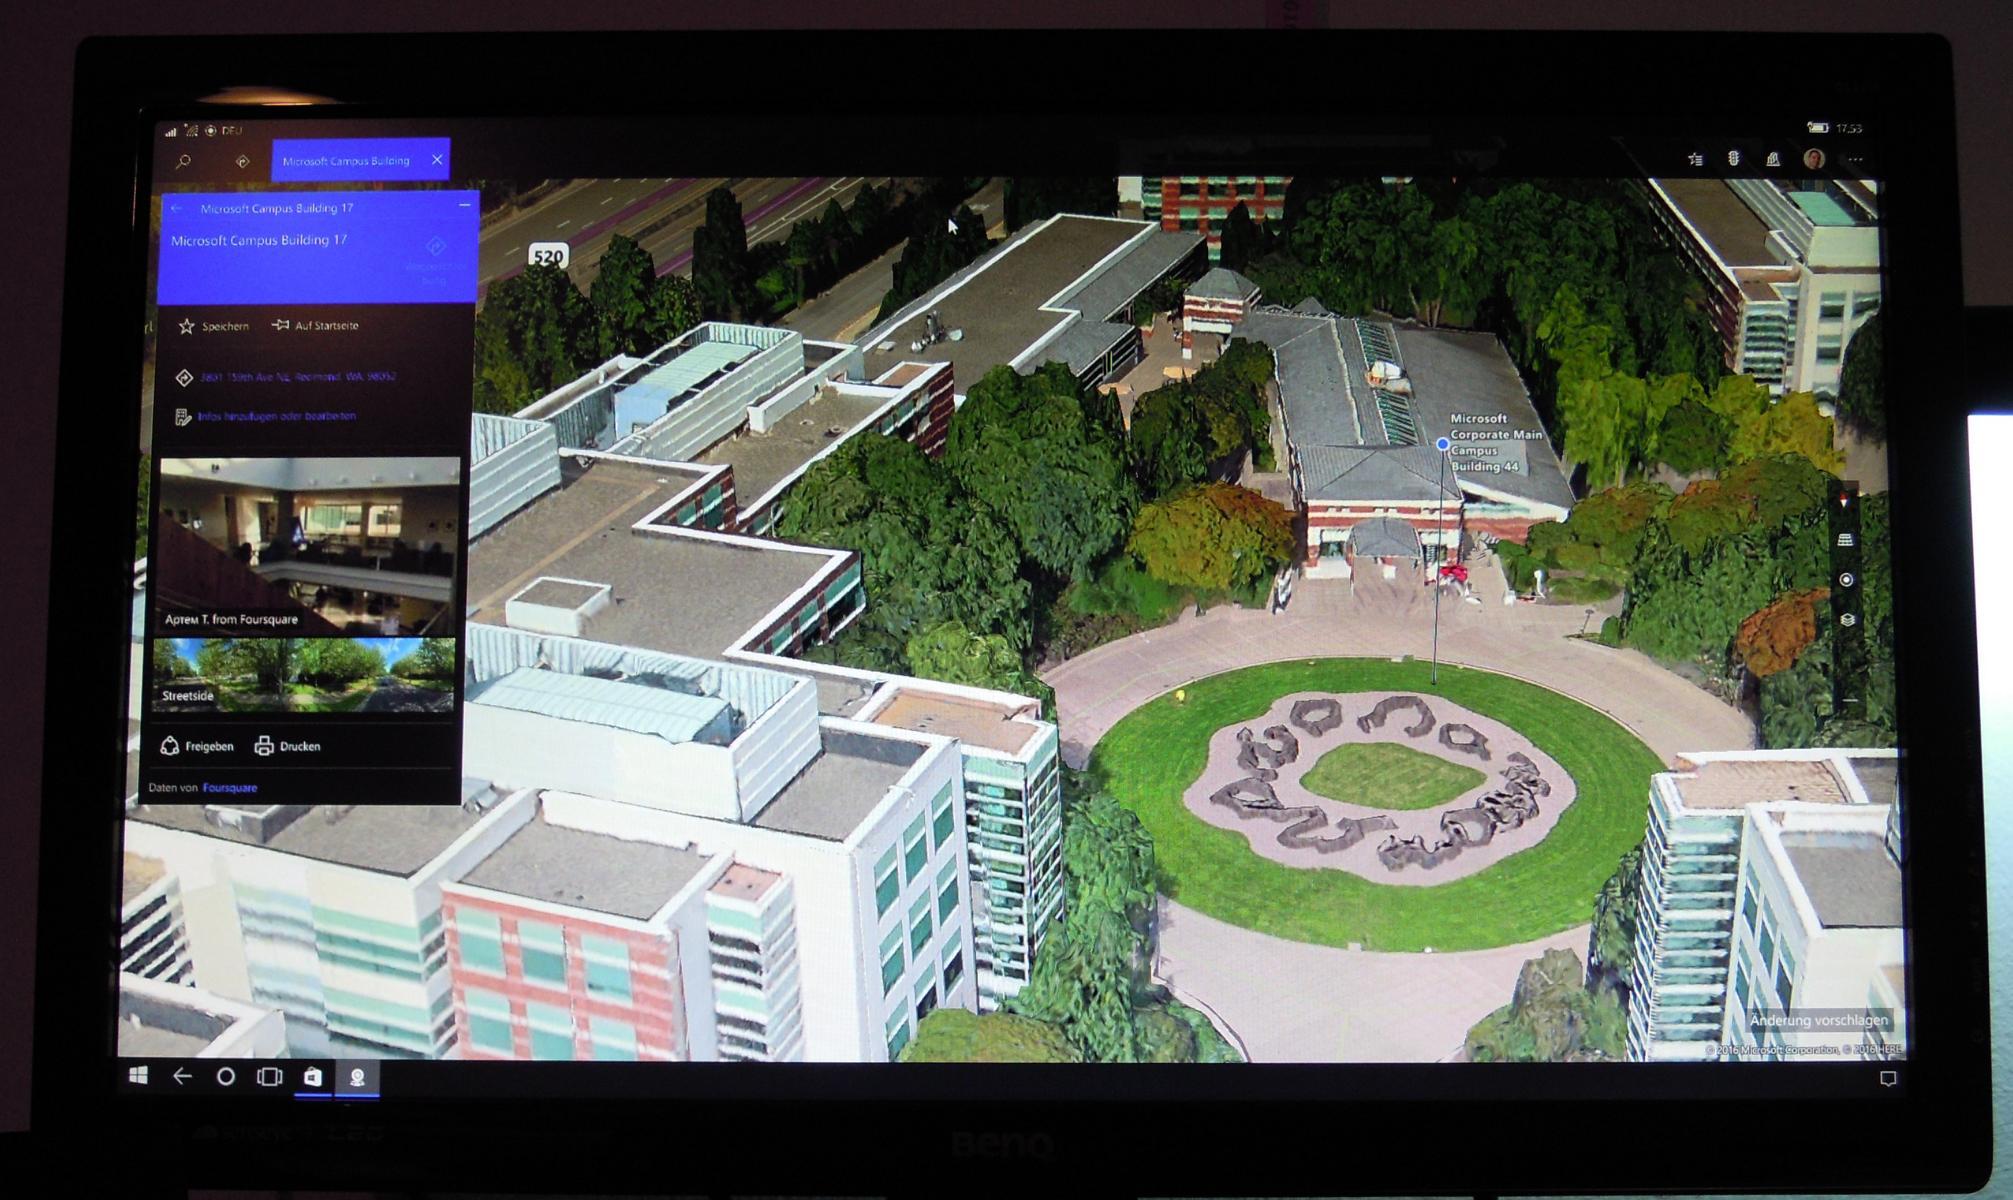 k1600_karten-app-microsoft-campus-building-17